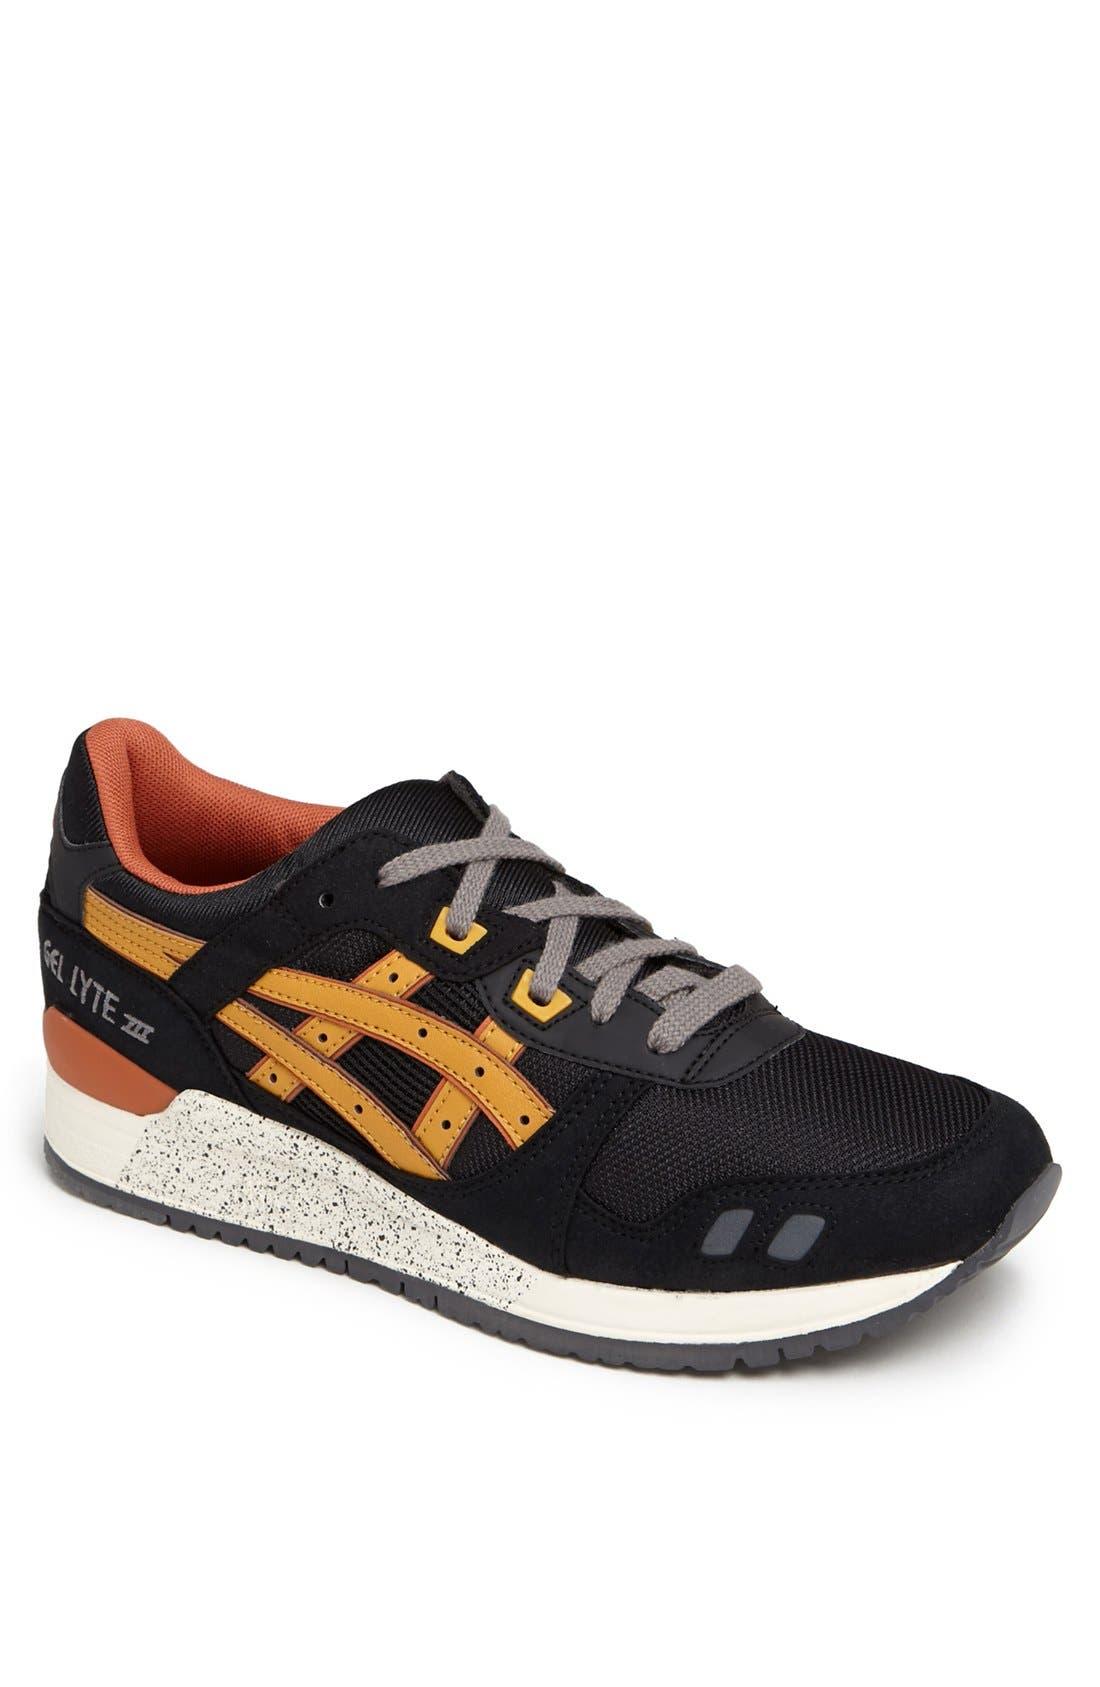 ASICS<SUP>®</SUP> 'GEL-Lyte III' Sneaker, Main, color, 002